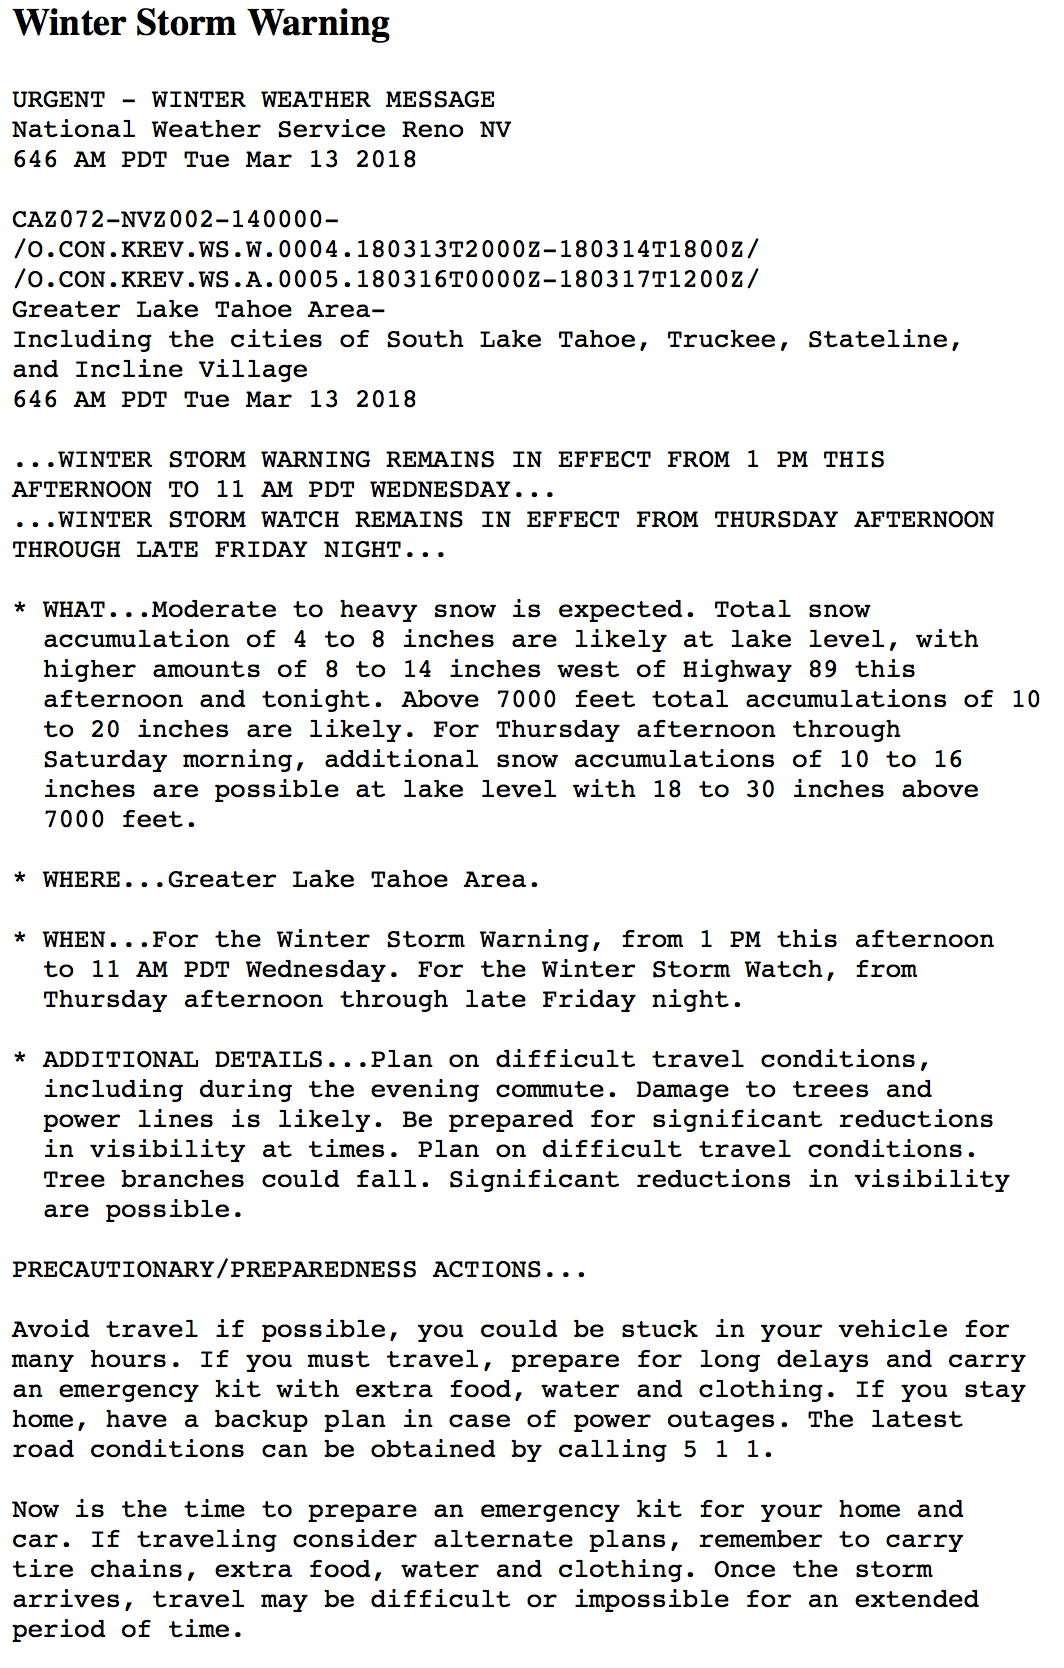 california, winter storm warning, avalanche warning